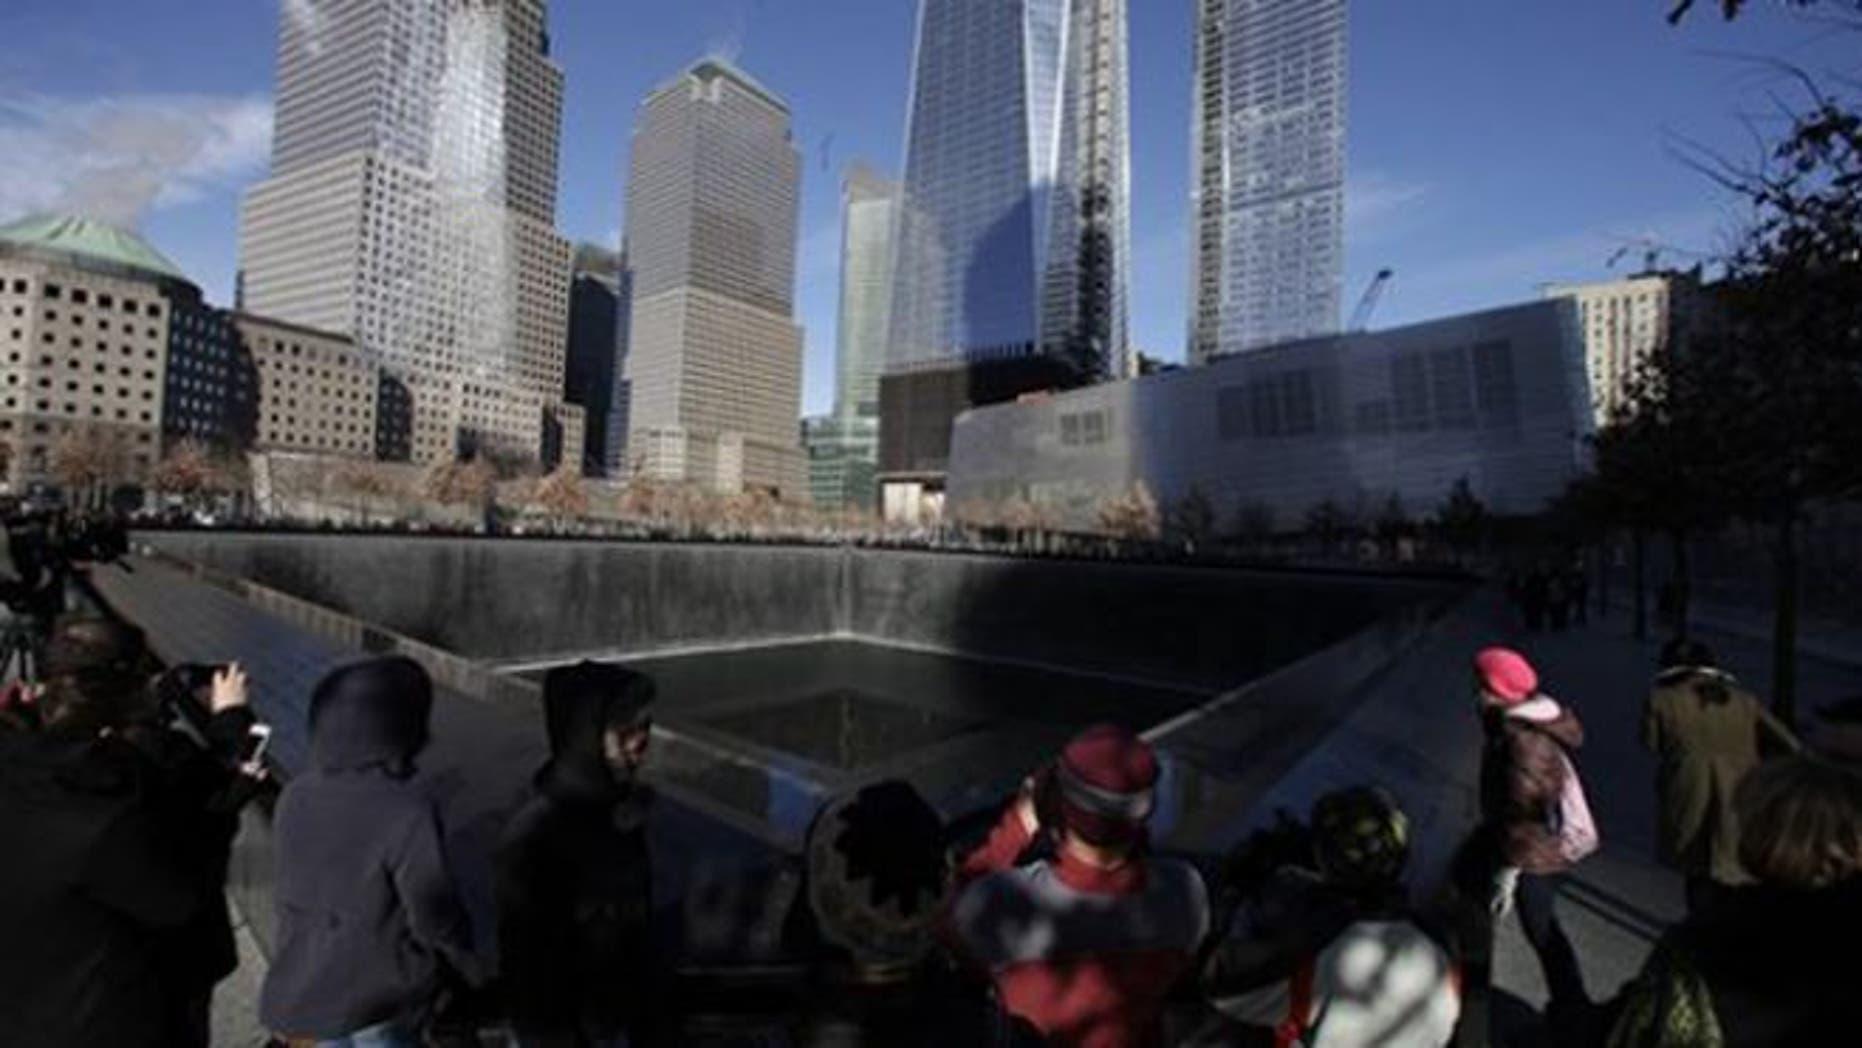 Dec. 29, 2011: Visitors walk around the National September 11 Memorial.